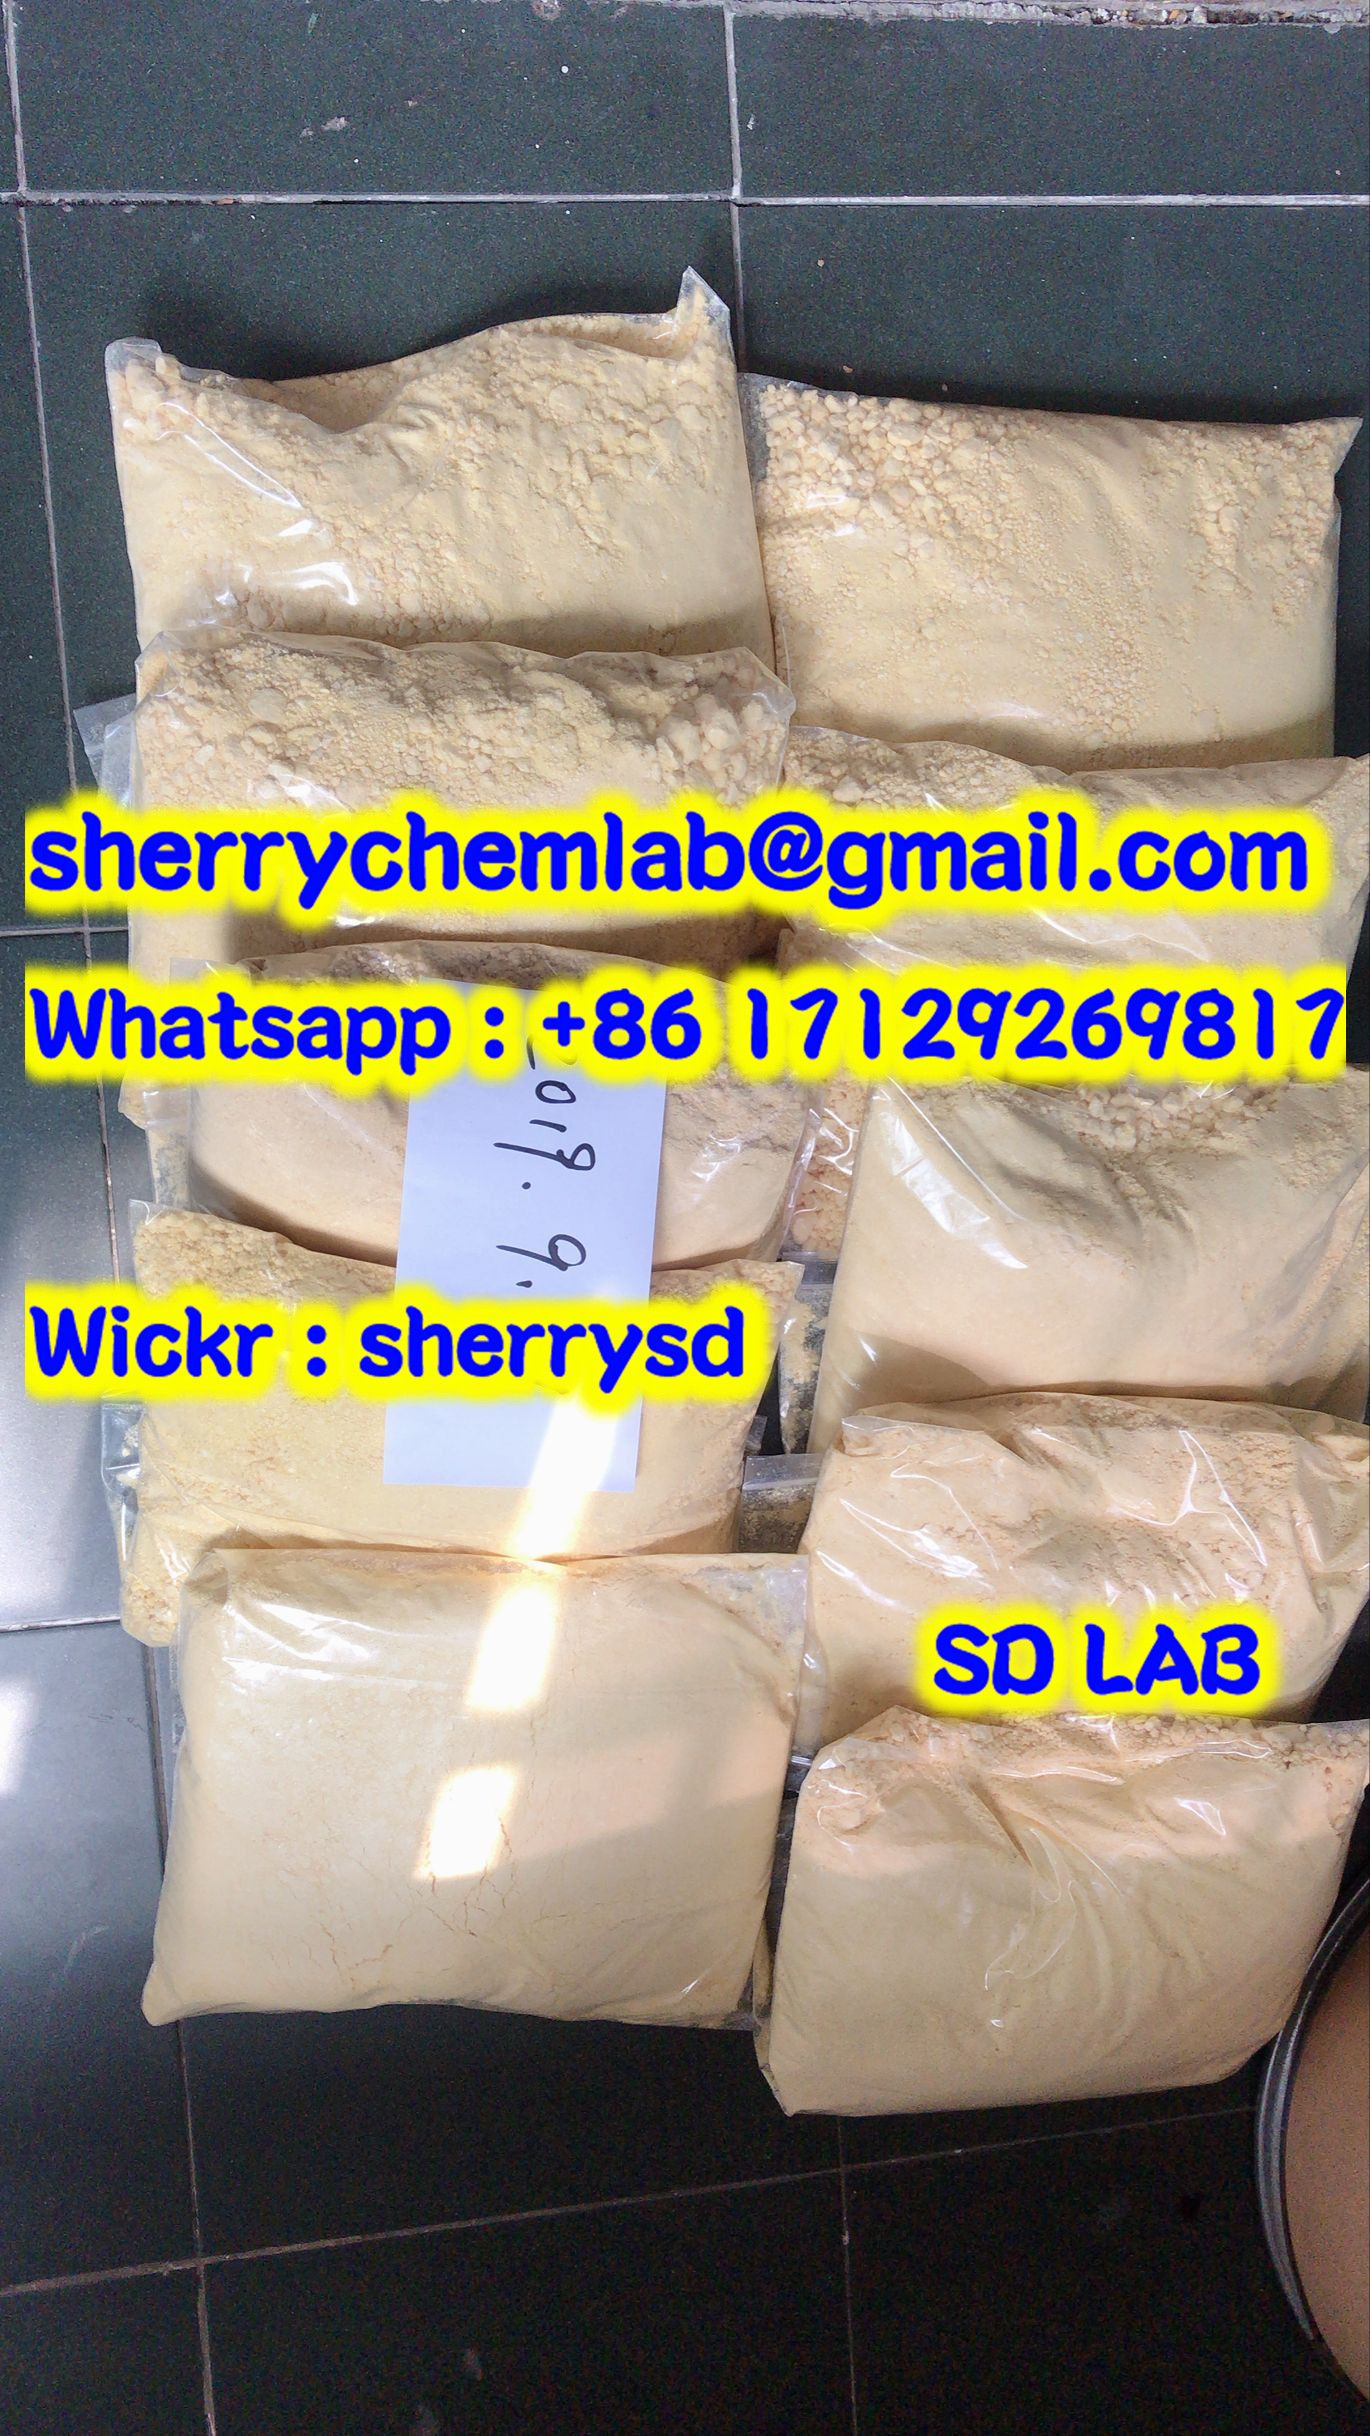 Stock 5FEMP  MPHP2201 MDMB-4en-PINACA white powder safe factory(sherychemlab@gmail.com)